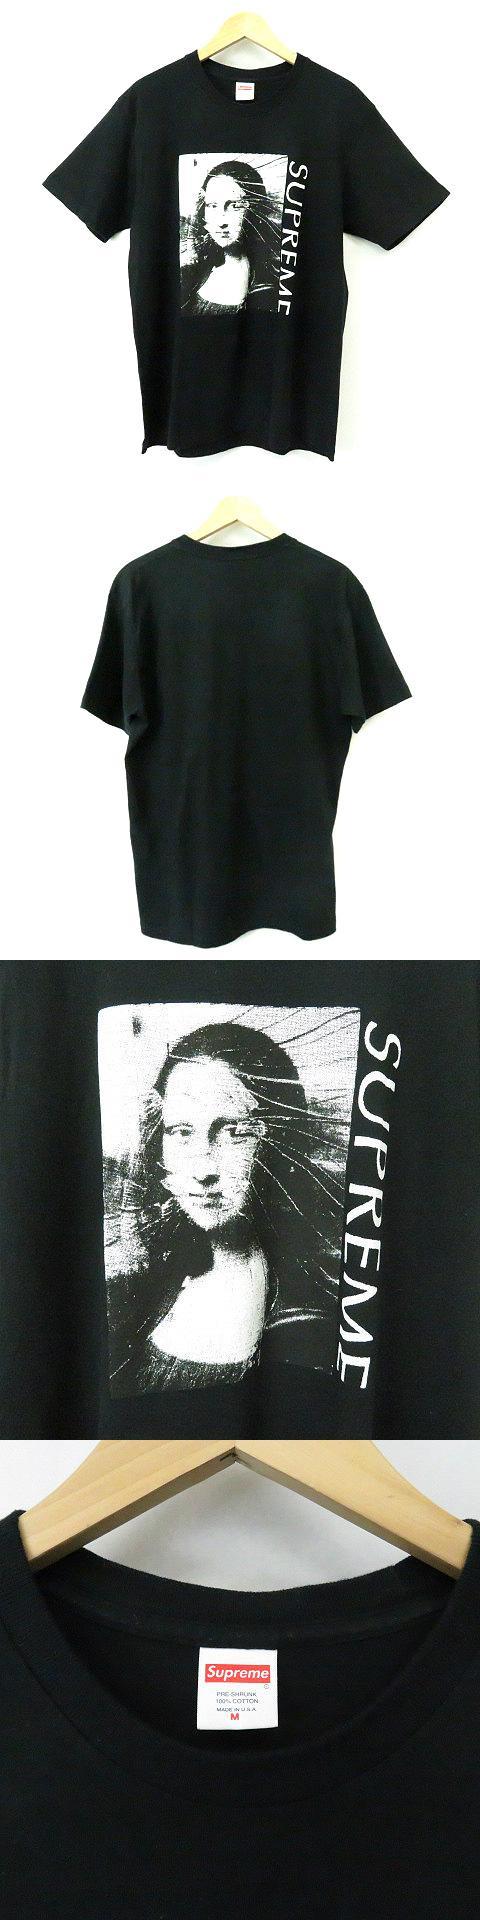 ★AA☆18SS Mona Lisa Tee Black モナリザ プリント 半袖Tシャツ カットソー 黒 M